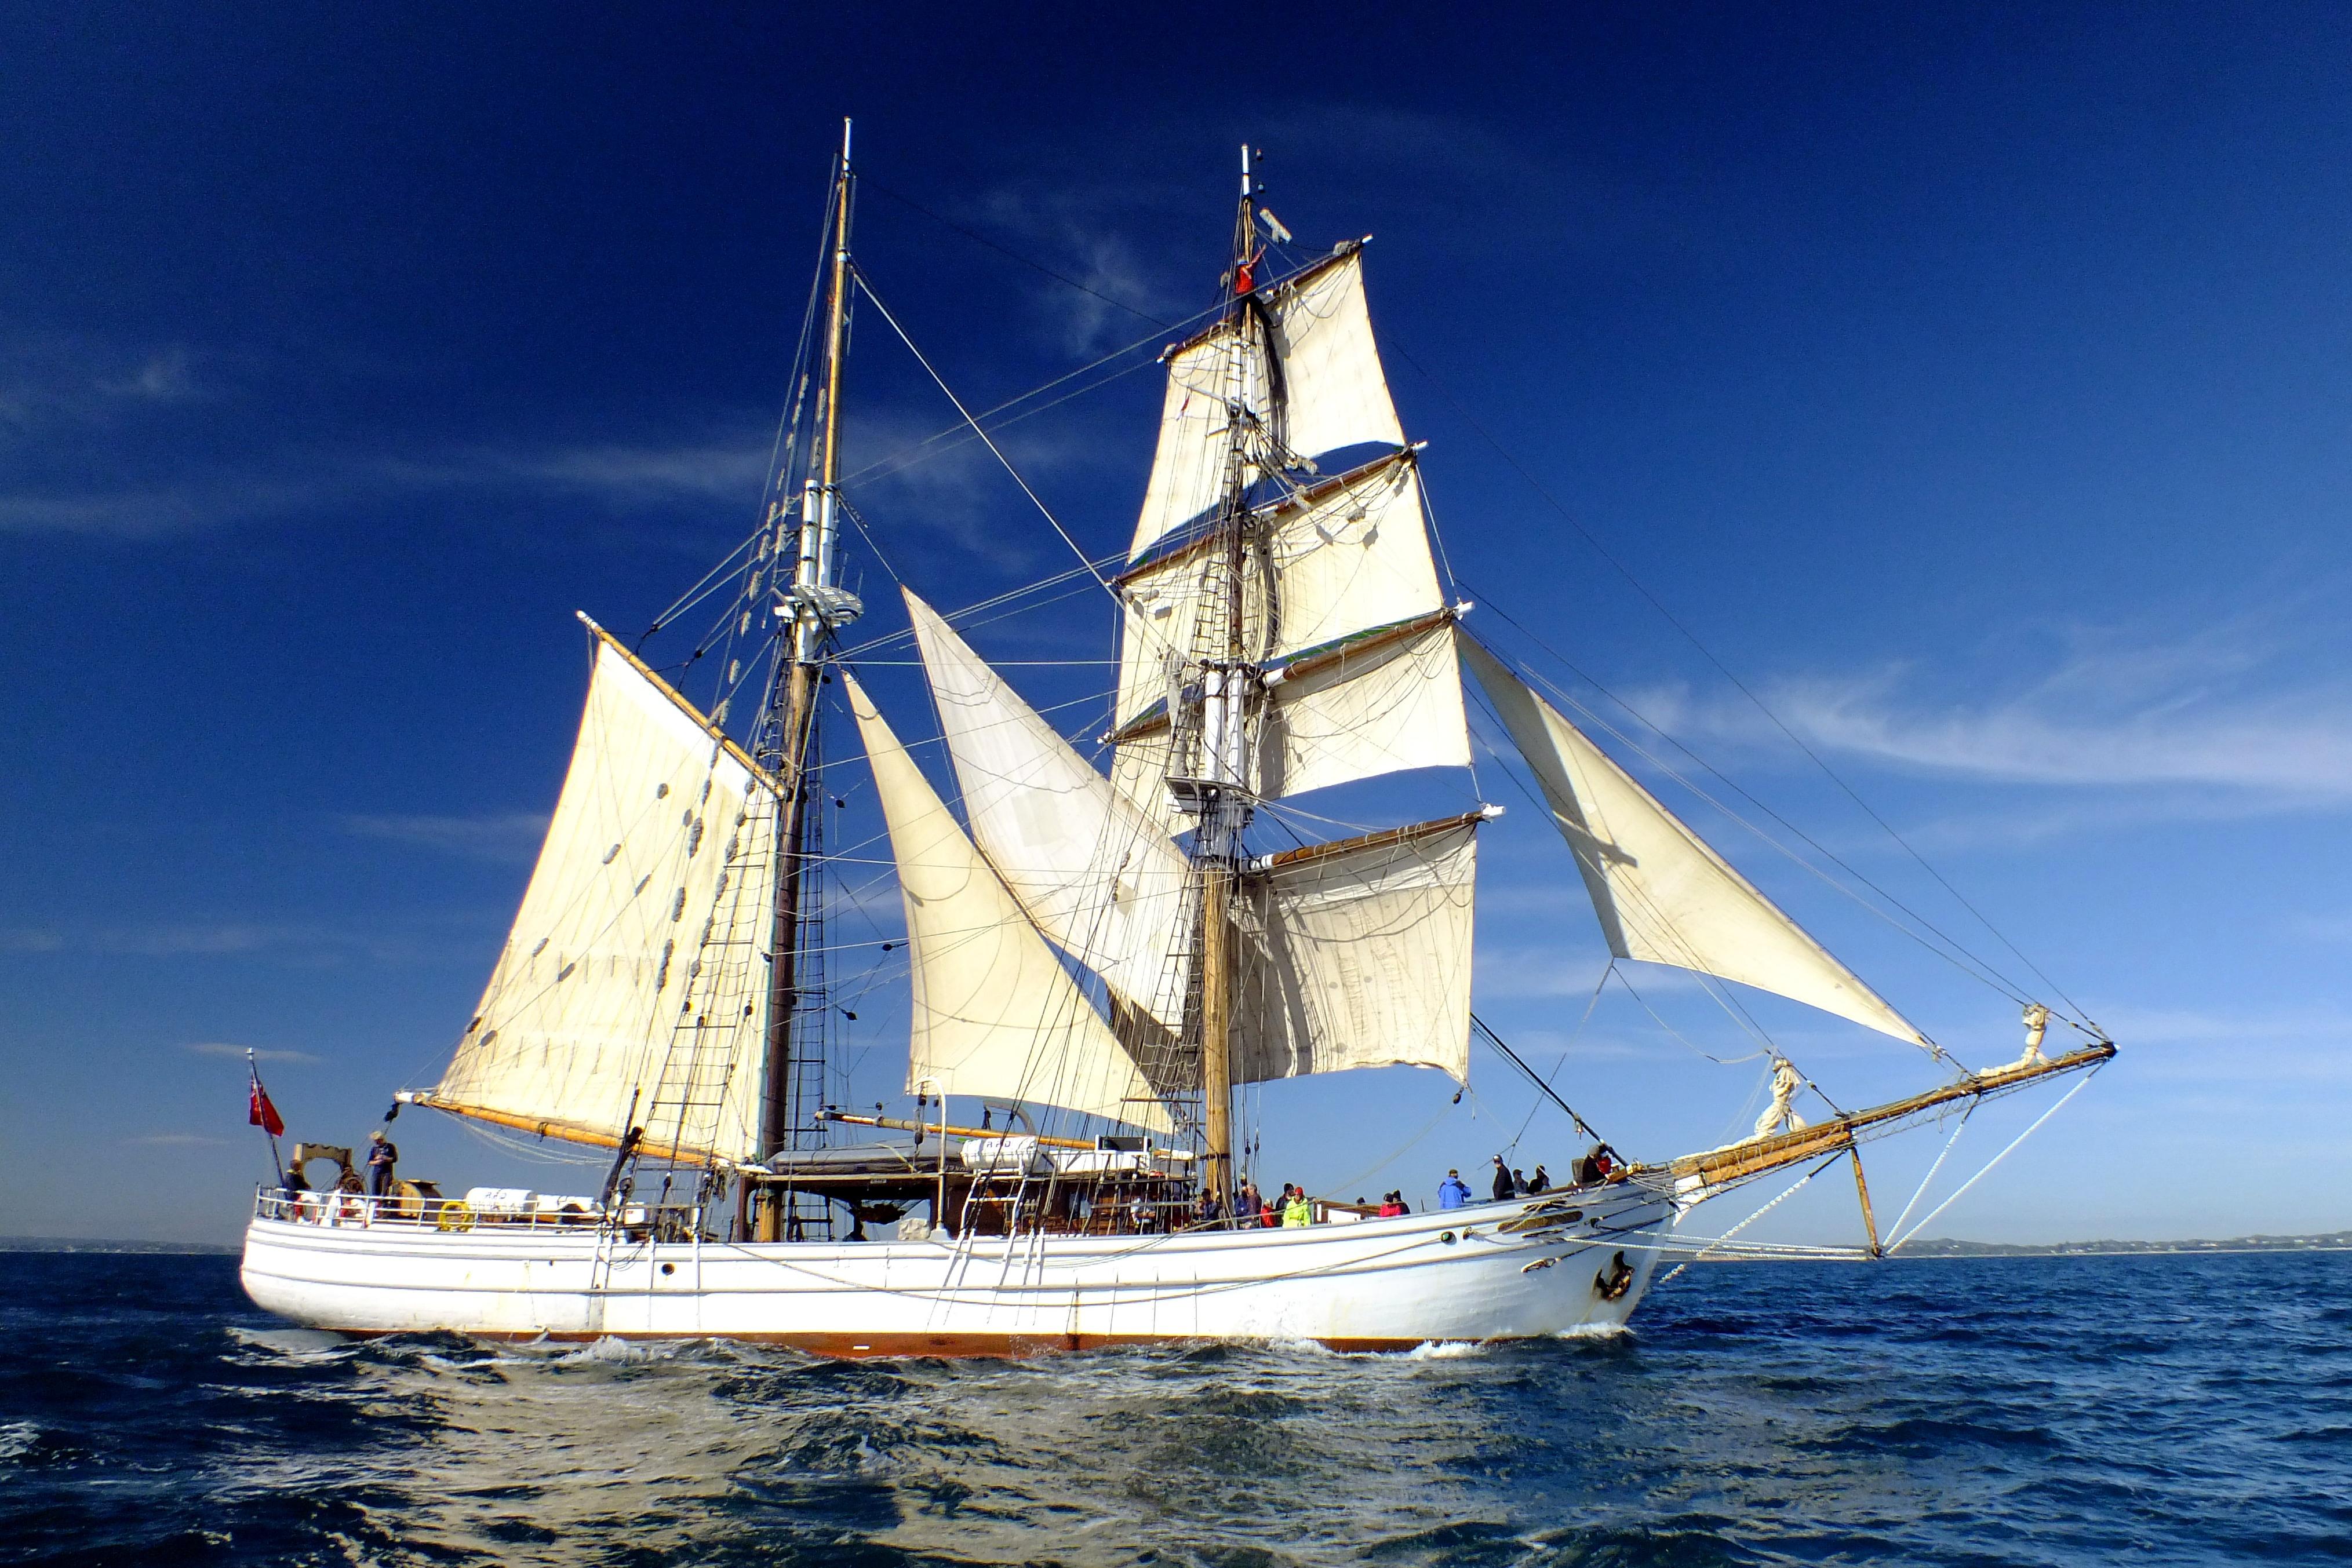 soren-larsen-sailing-ship-sydney